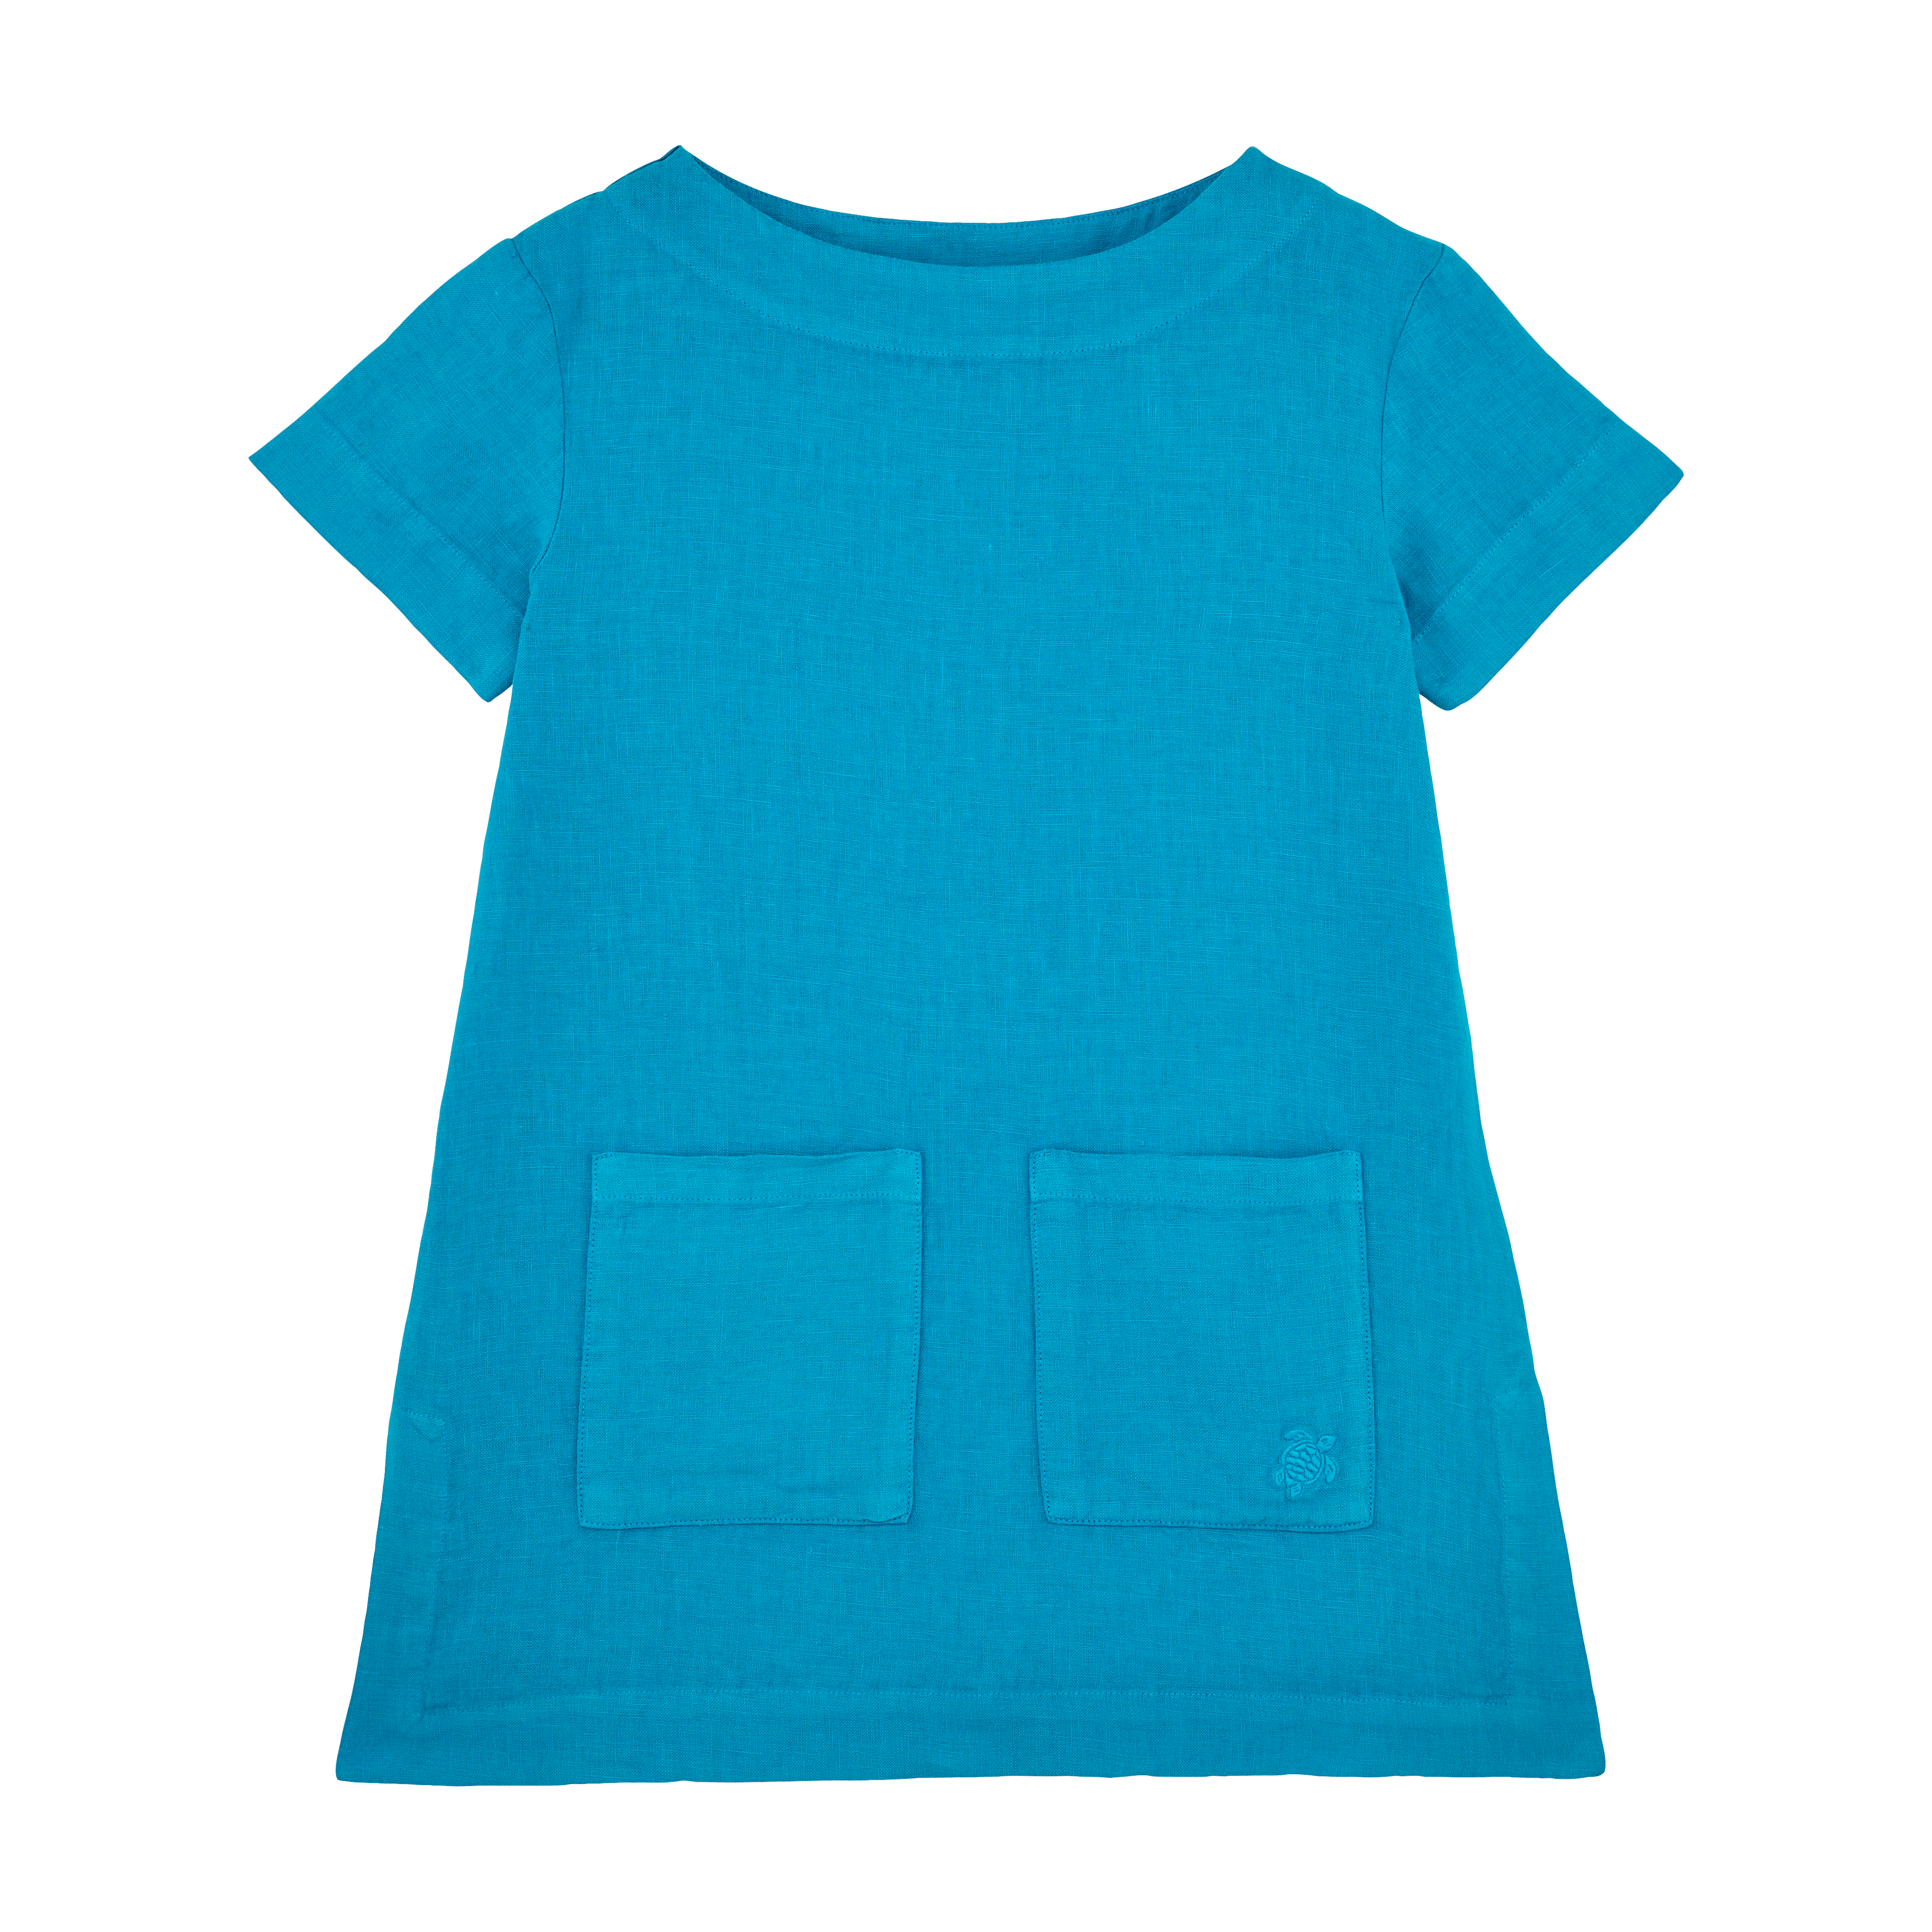 VILEBREQUIN | Girls Ready to Wear - Girls Linen Dress Solid - DRESS - GELATINE - Blue - 14 - Vilebrequin | Goxip